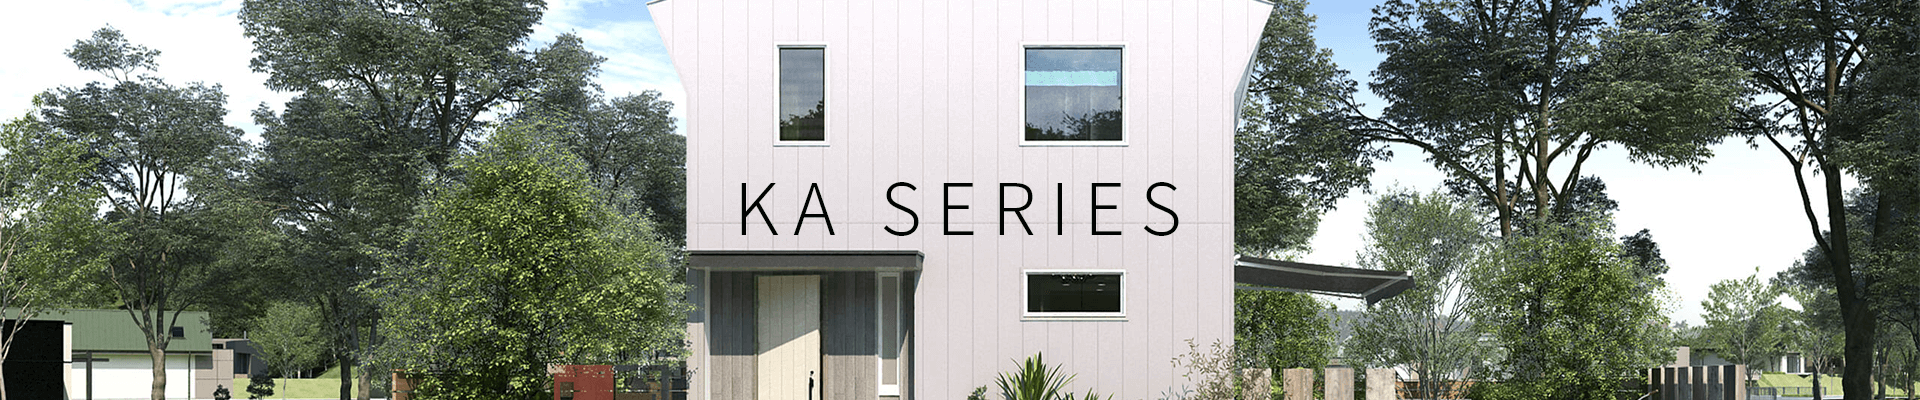 KAシリーズページトップ